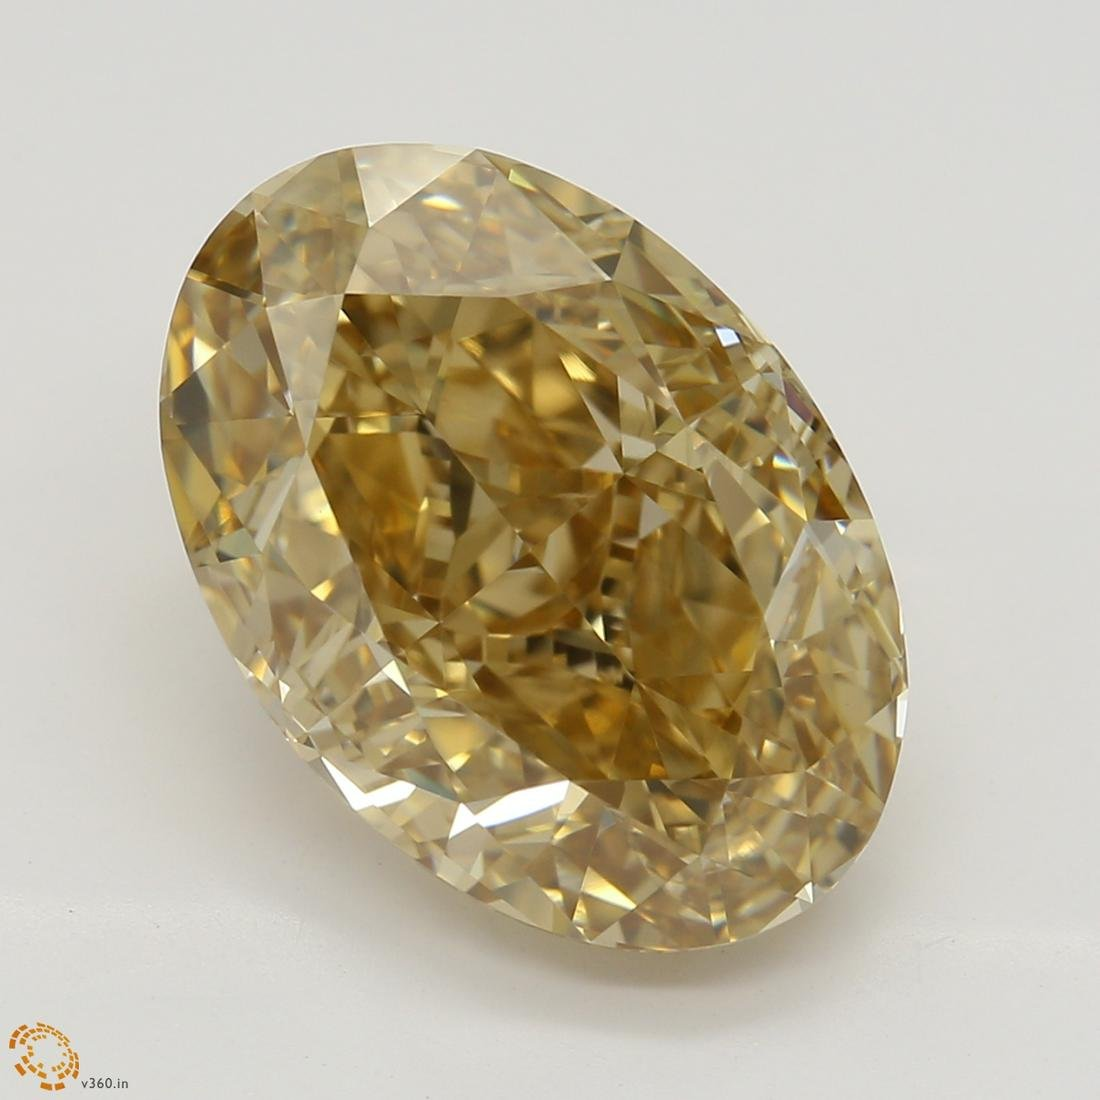 5.02 ct, Orange-Brown/VVS2, Oval cut Diamond